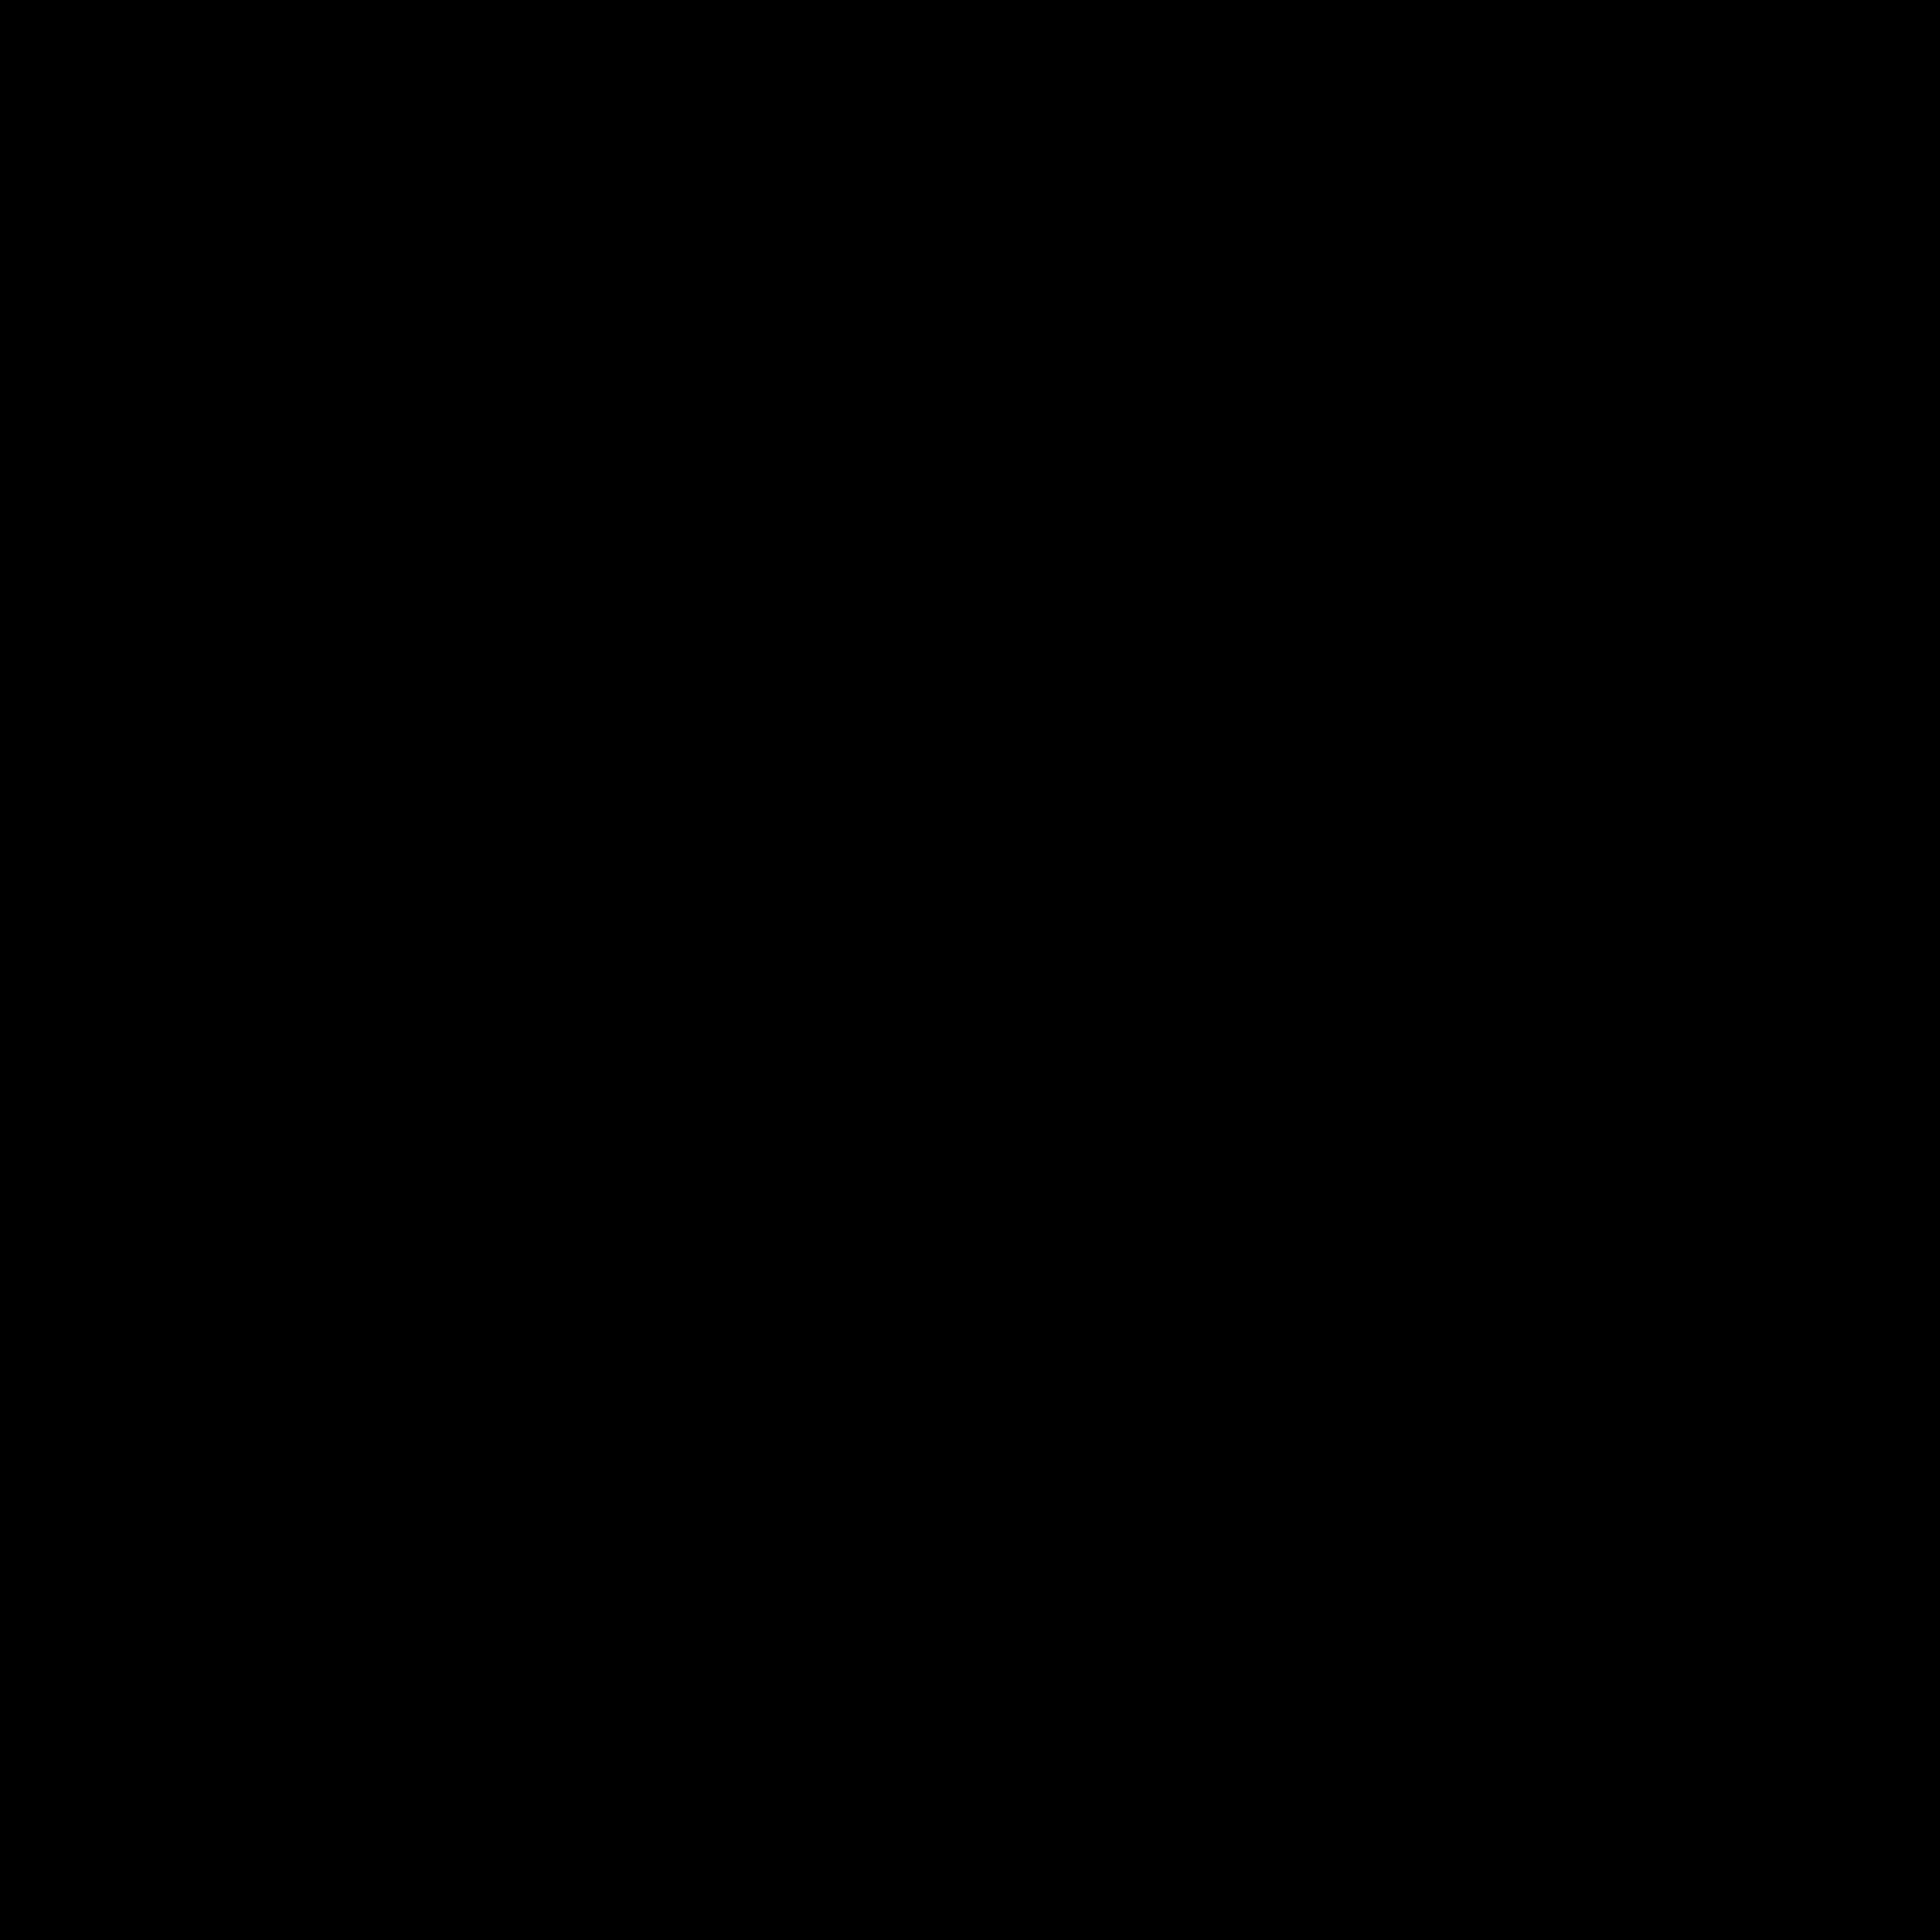 Crayola 1313 Logo PNG Transparent & SVG Vector - Freebie Supply